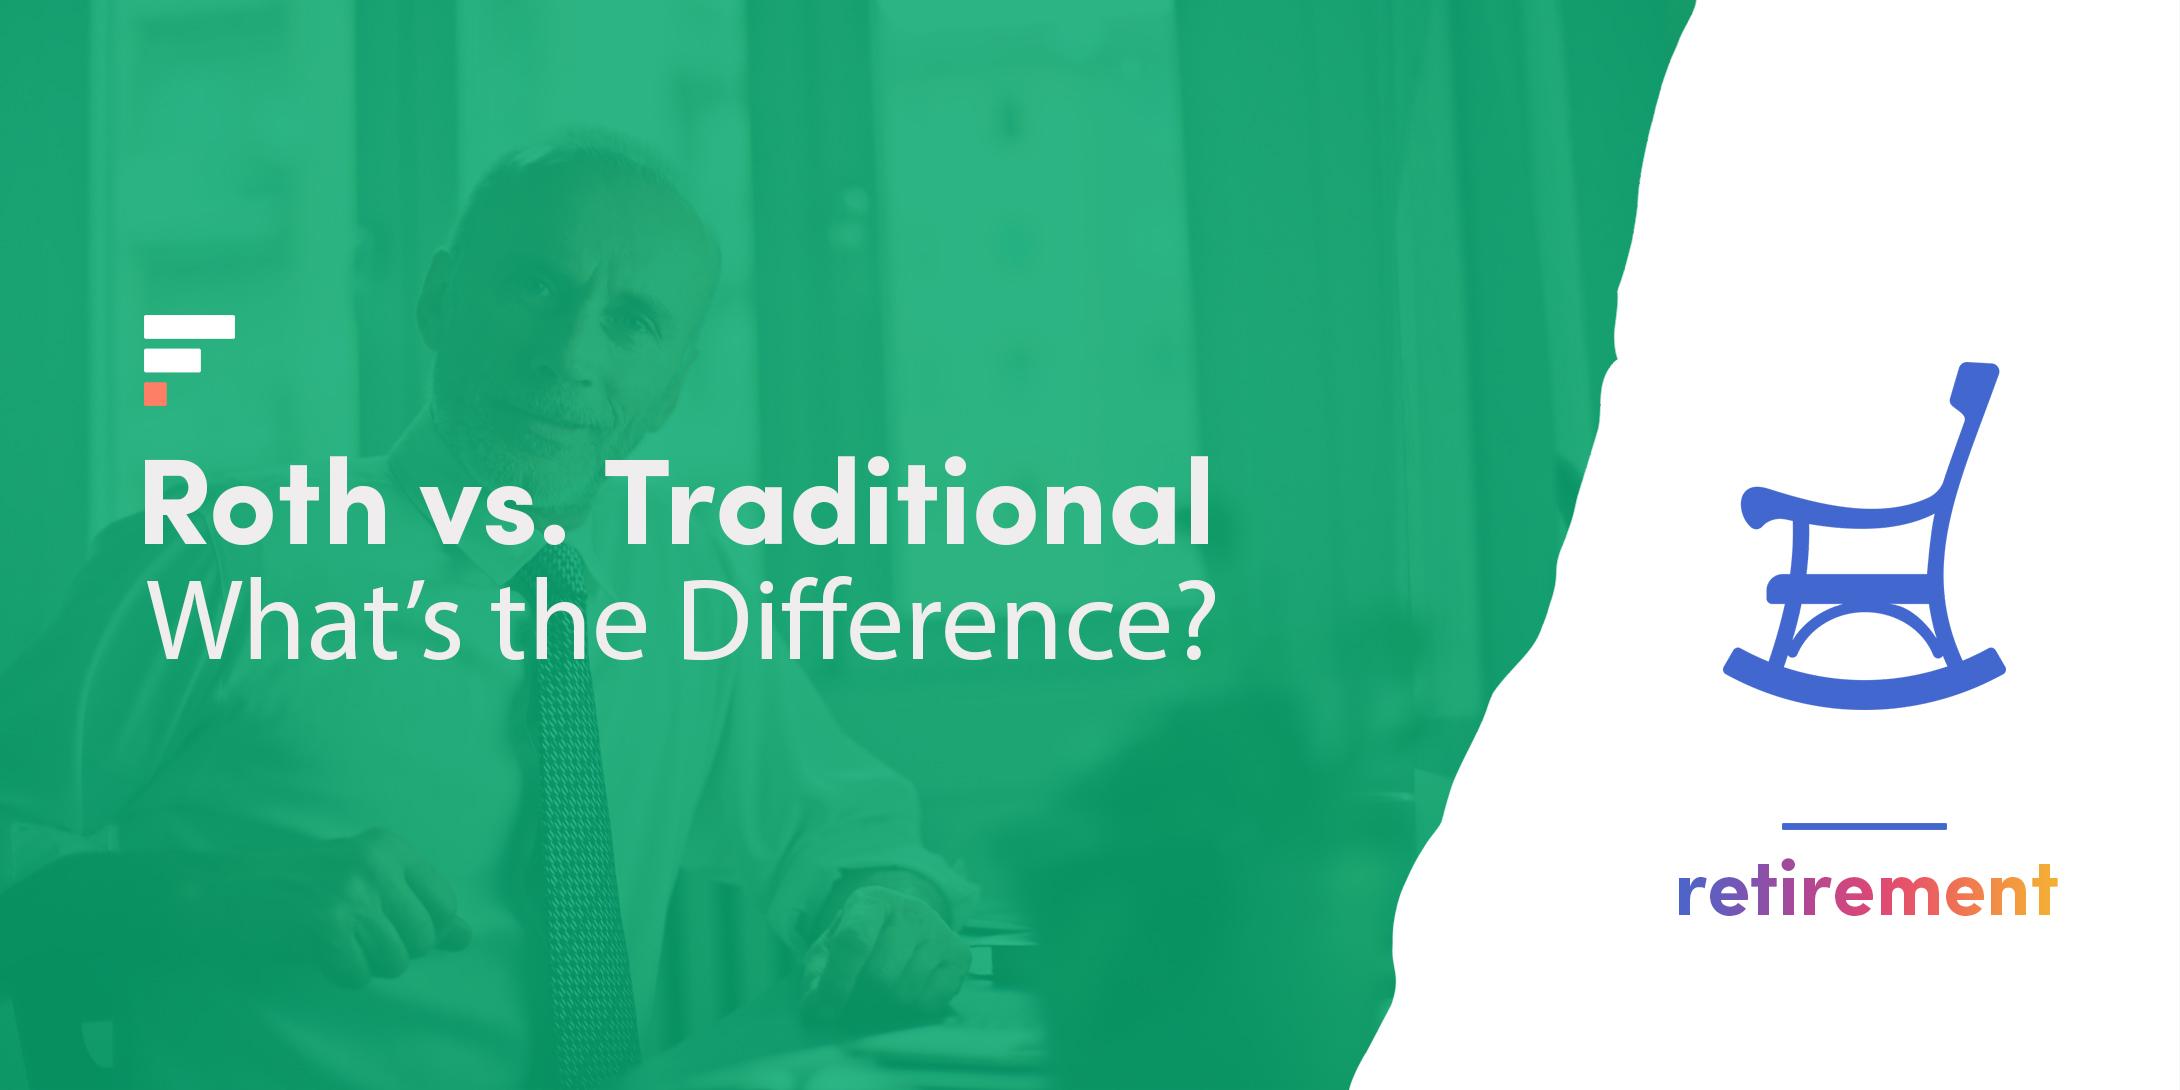 Roth vs traditional retirement accounts